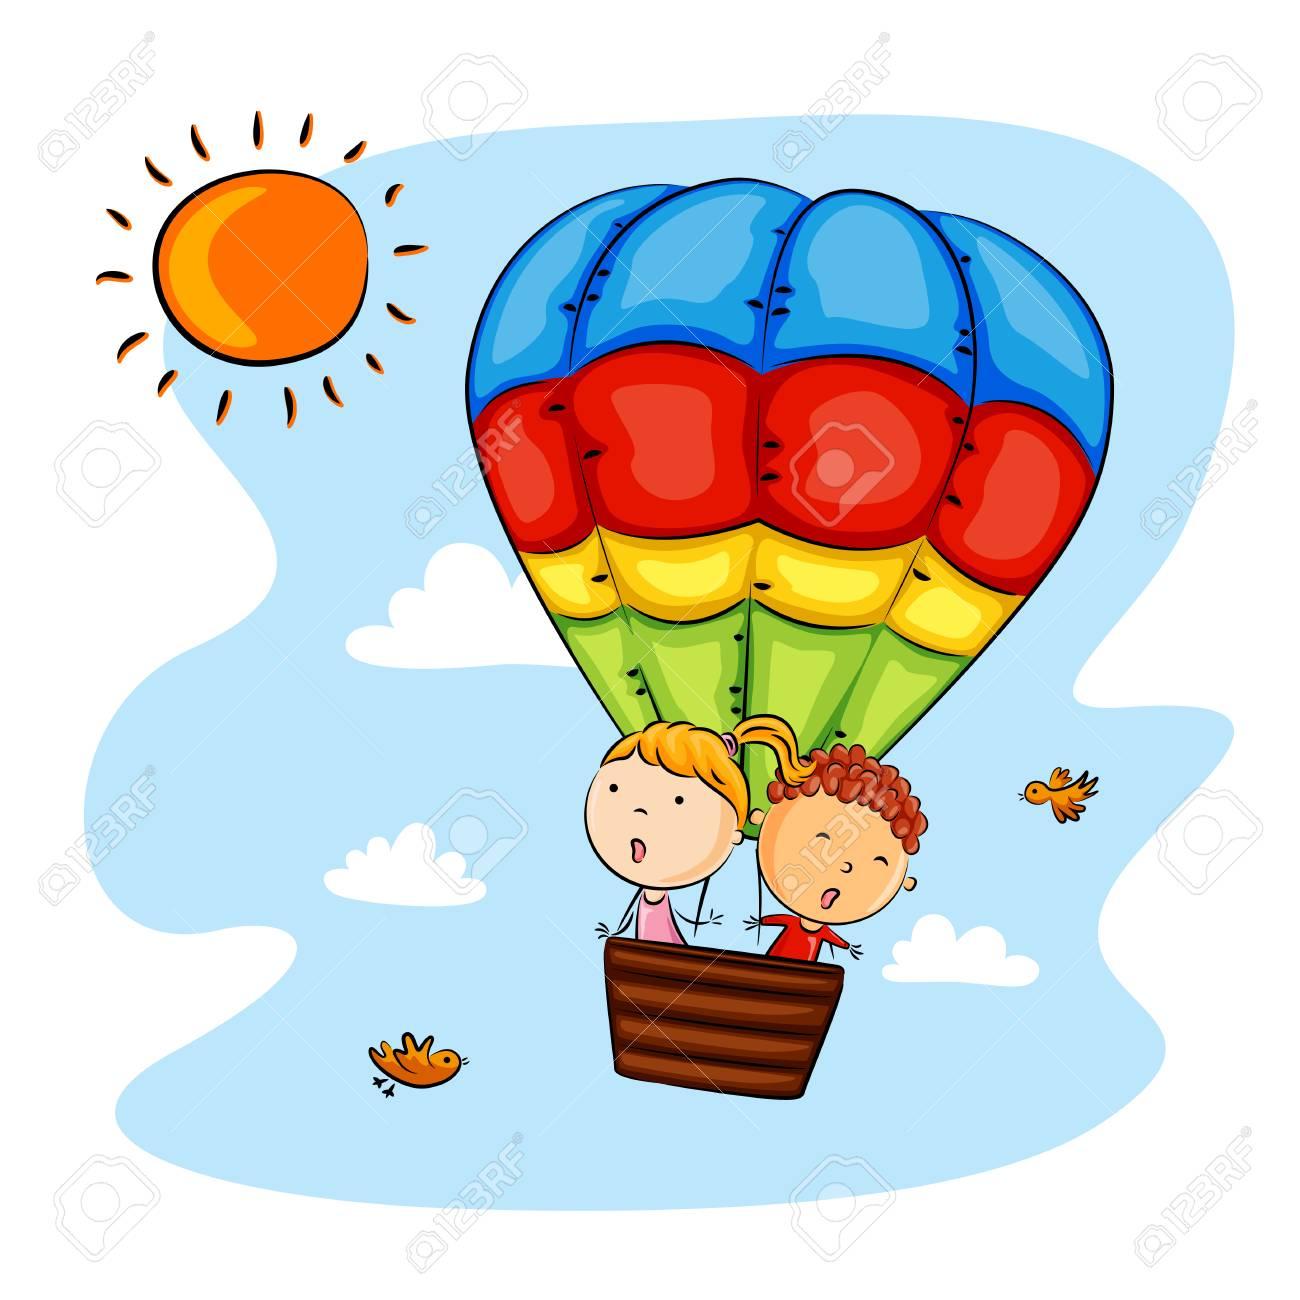 Happy kids riding hot air balloon.